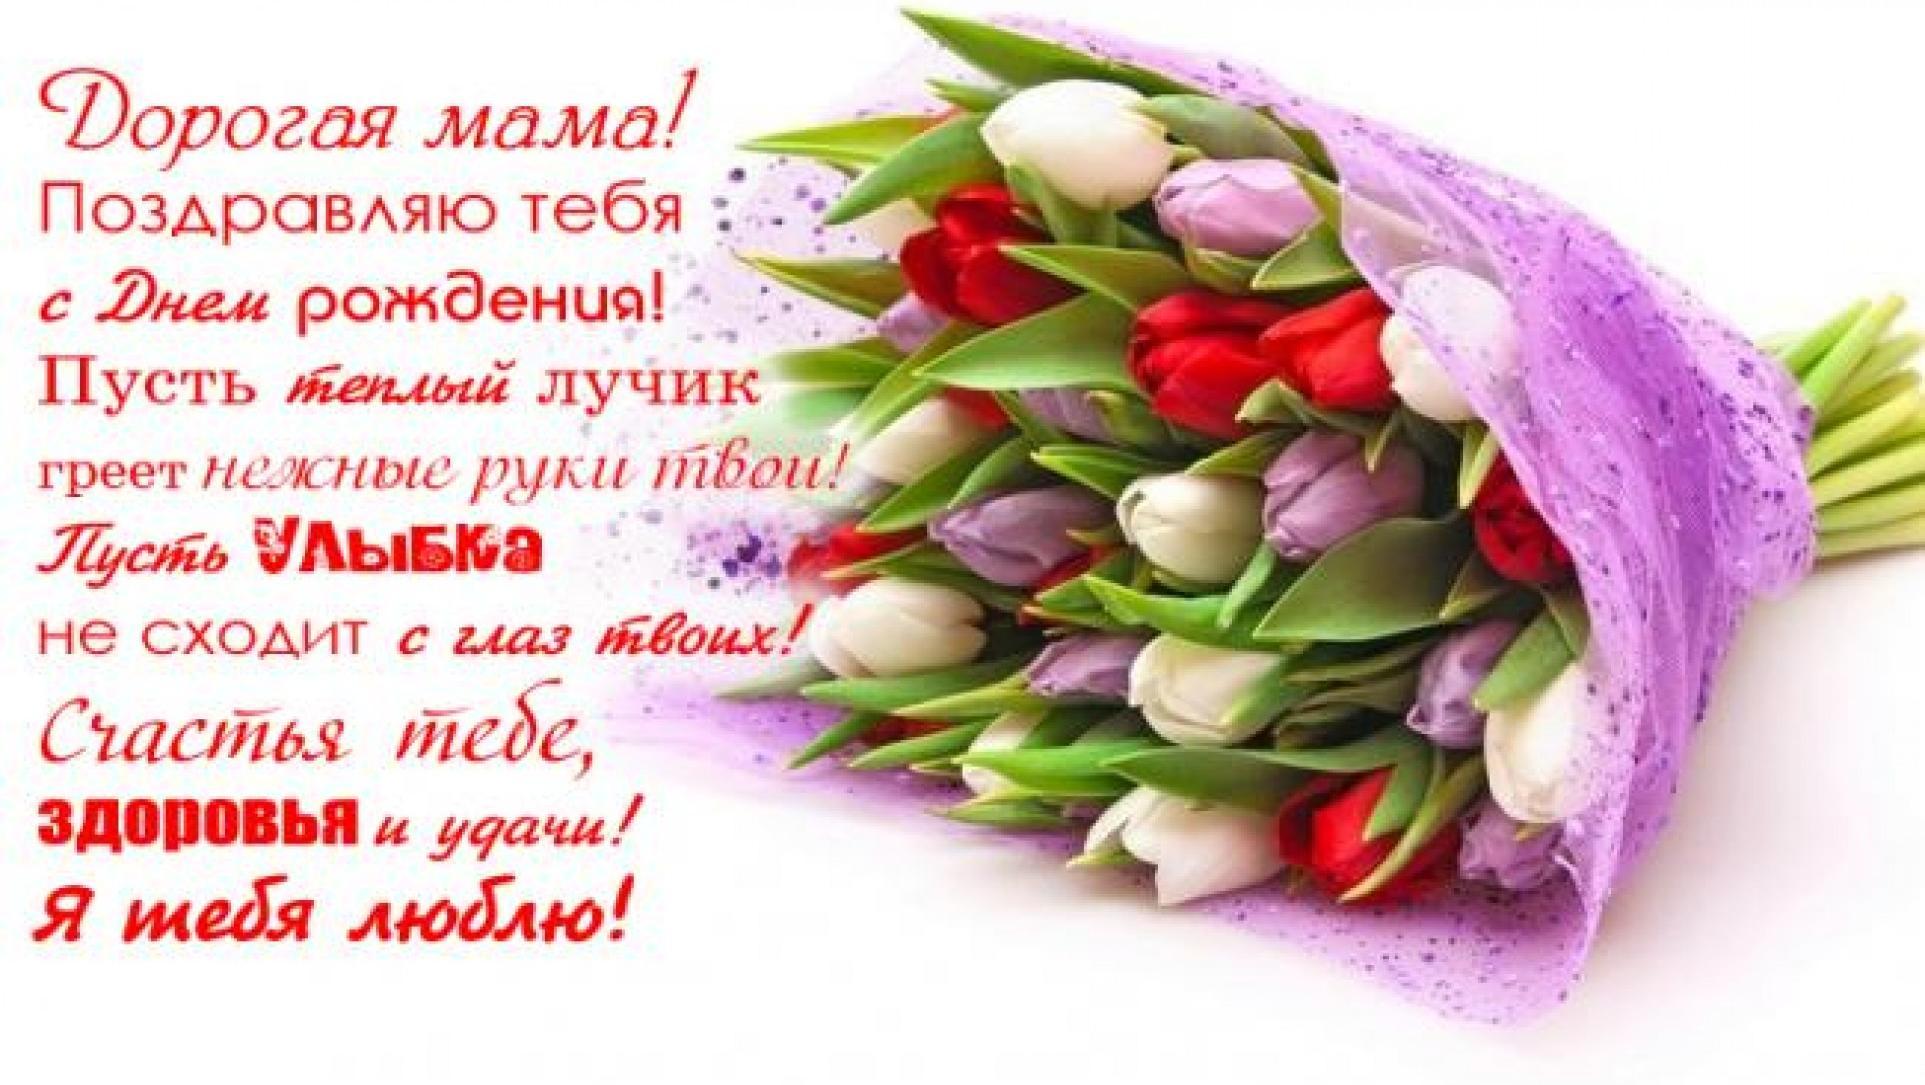 Поздравления маме от дочери, с днем рождения маме 3